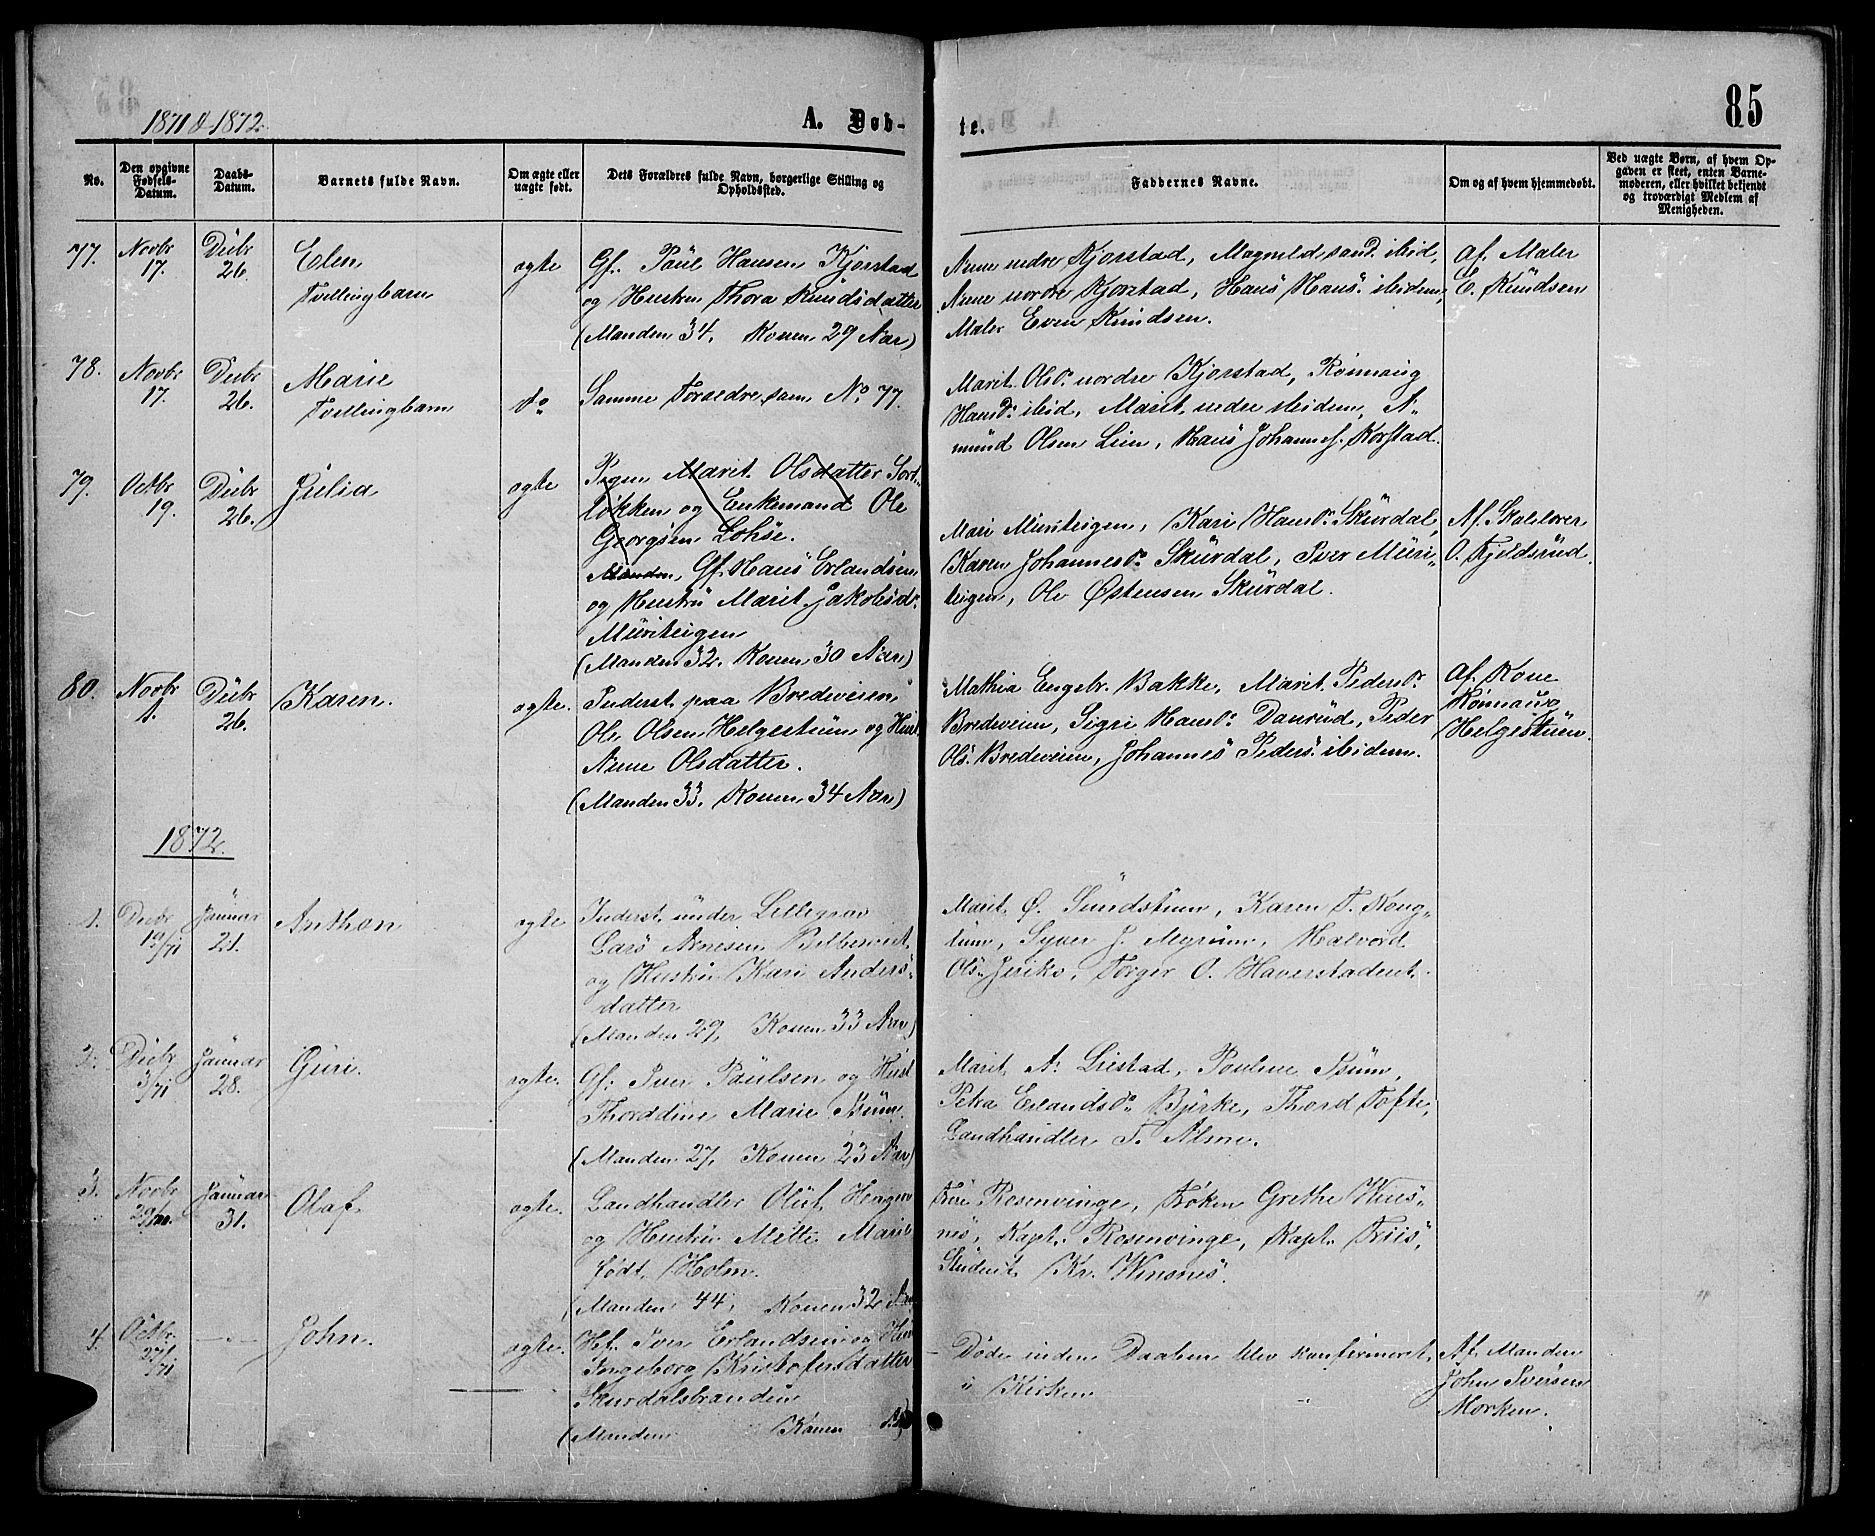 SAH, Sør-Fron prestekontor, H/Ha/Hab/L0002: Klokkerbok nr. 2, 1864-1883, s. 85